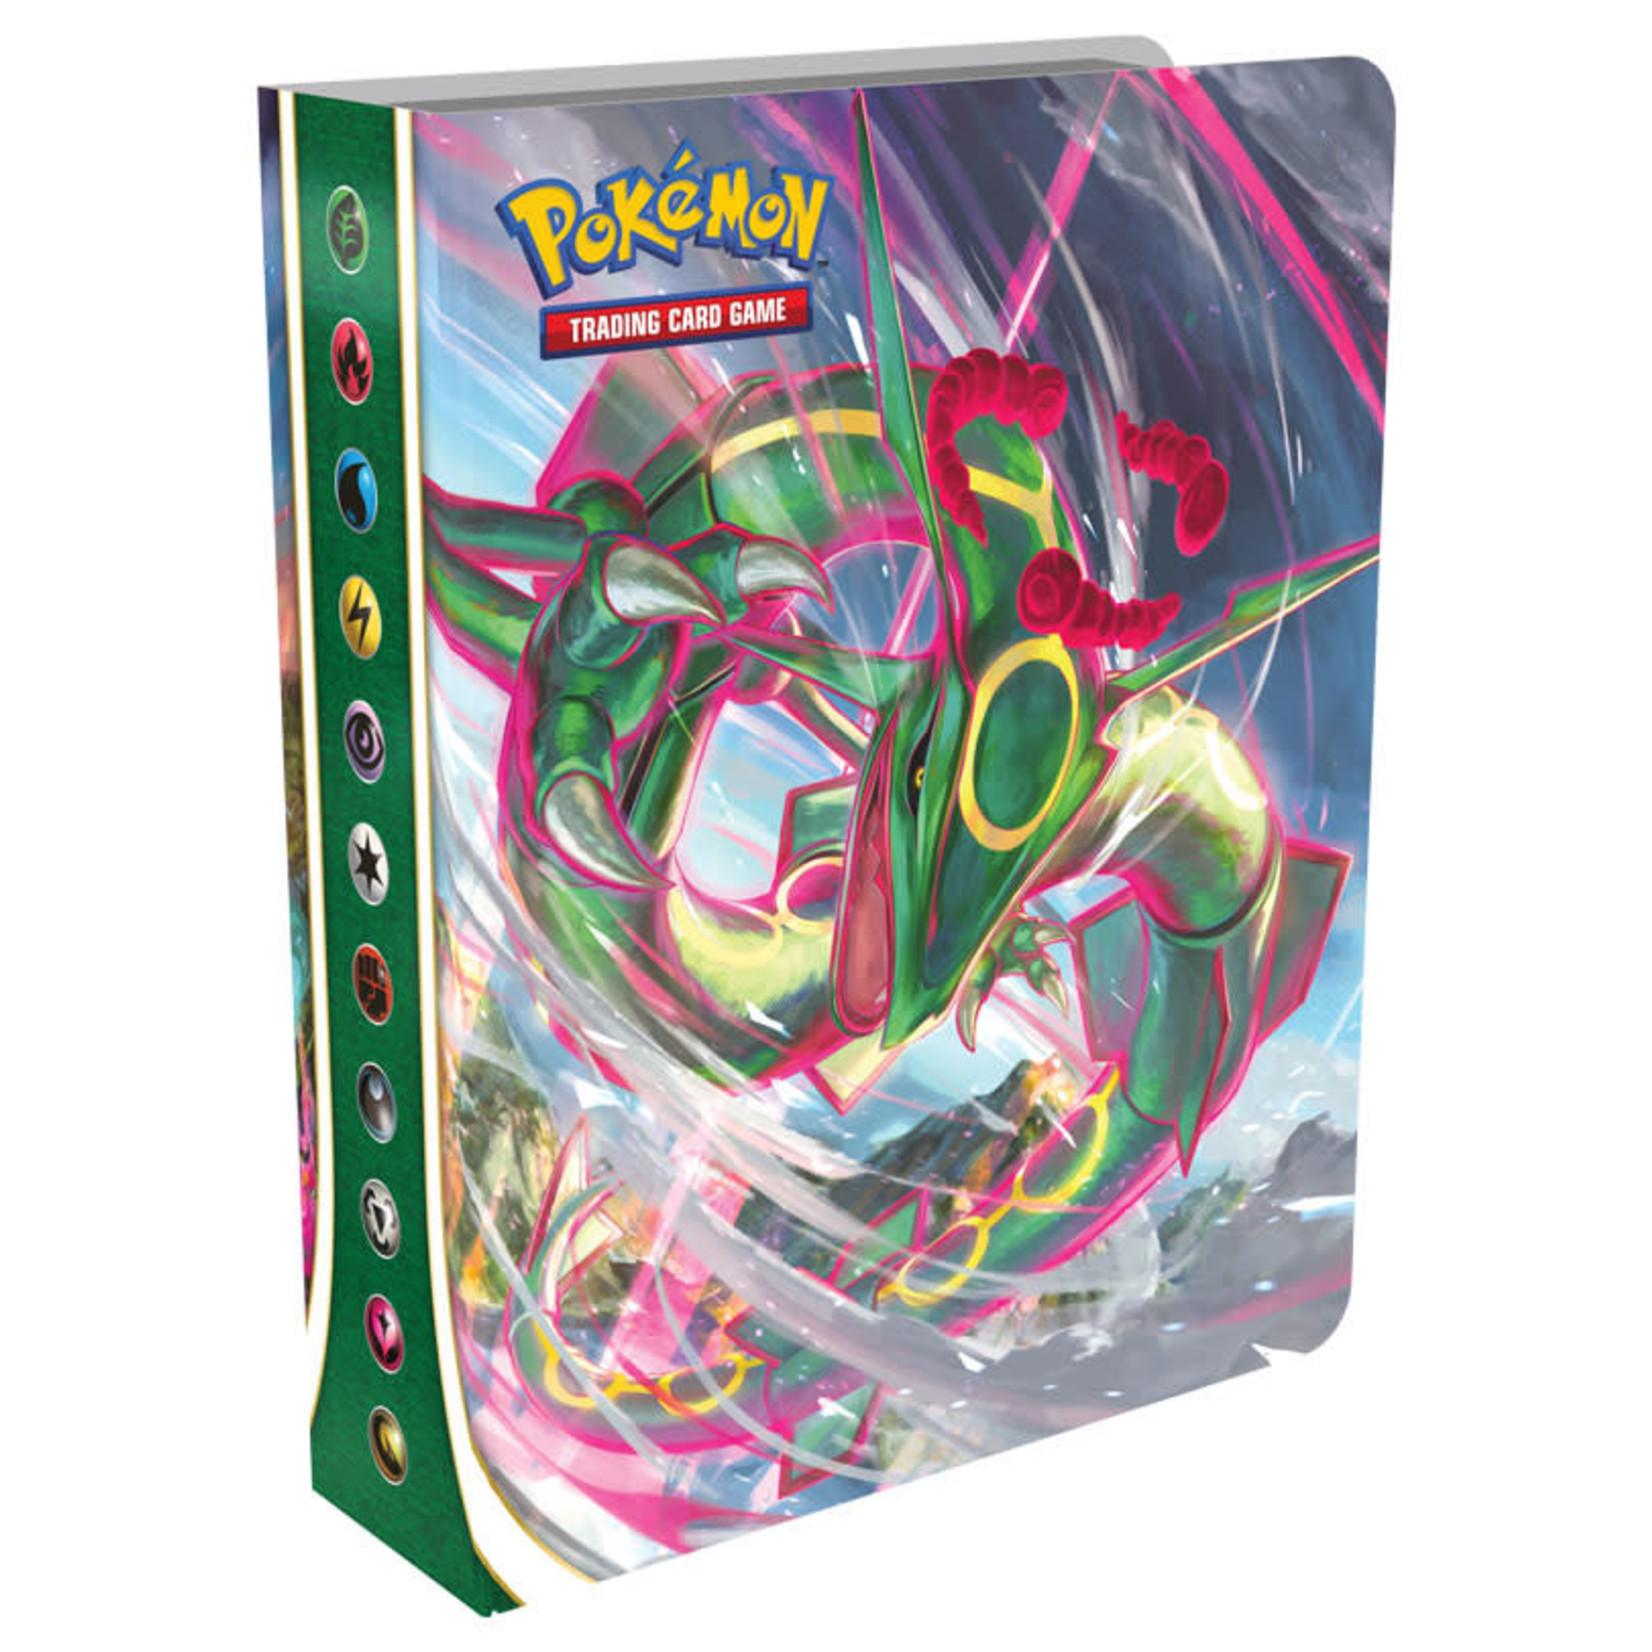 Pokémon Pokémon TCG: Sword & Shield—Evolving Skies Mini Portfolio